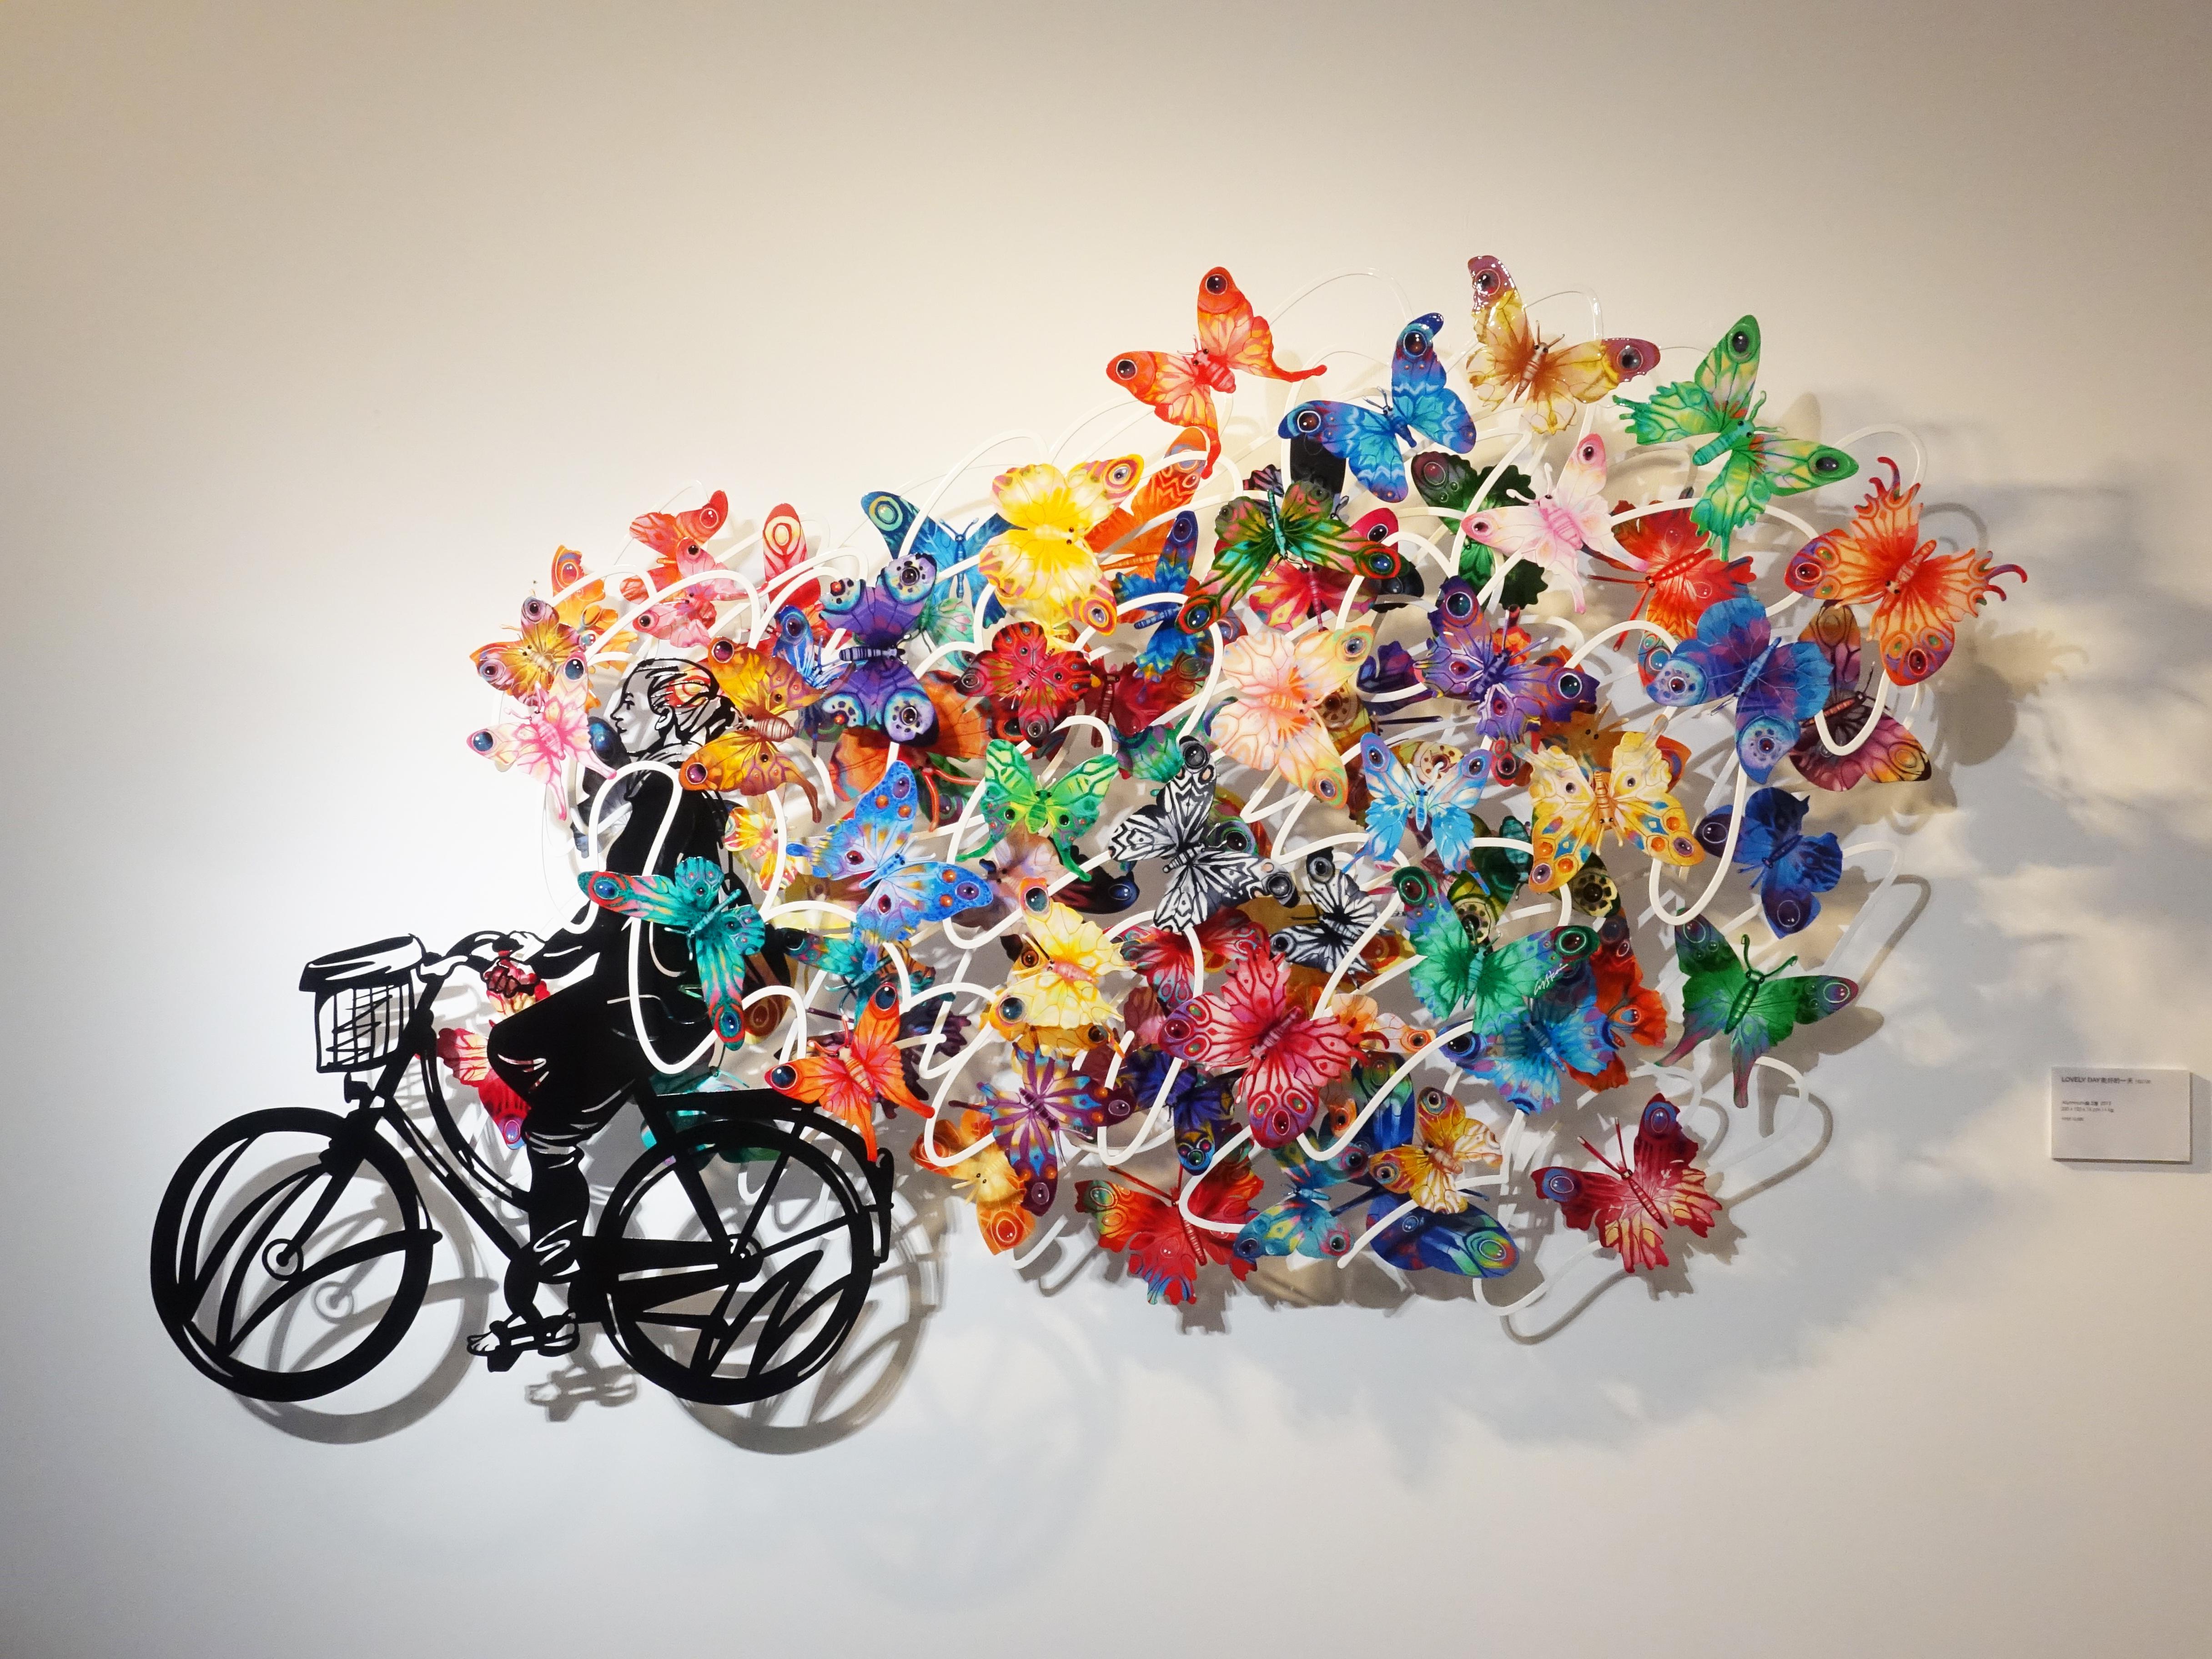 David Gerstein,《Lovely Day》,200 x 120 x 16 cm,Aluminum鋁3層,2015。